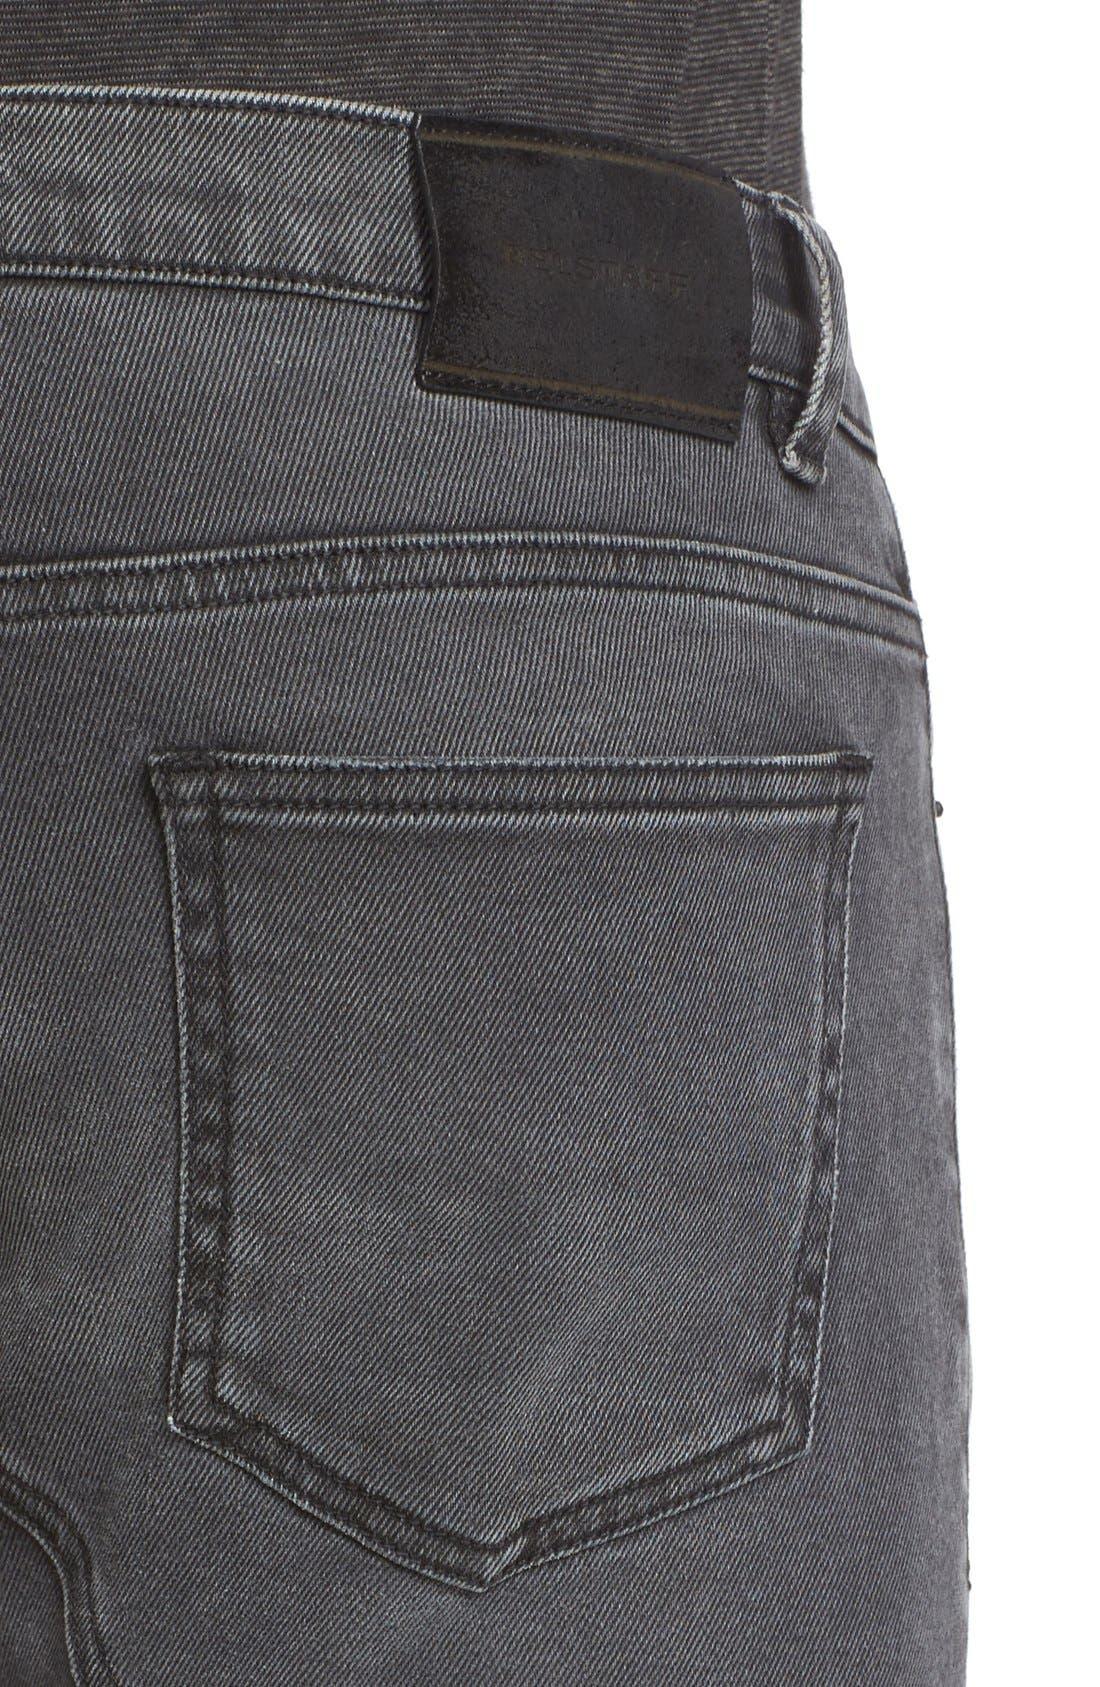 Eastham Slim Fit Stretch Denim Moto Jeans,                             Alternate thumbnail 6, color,                             022